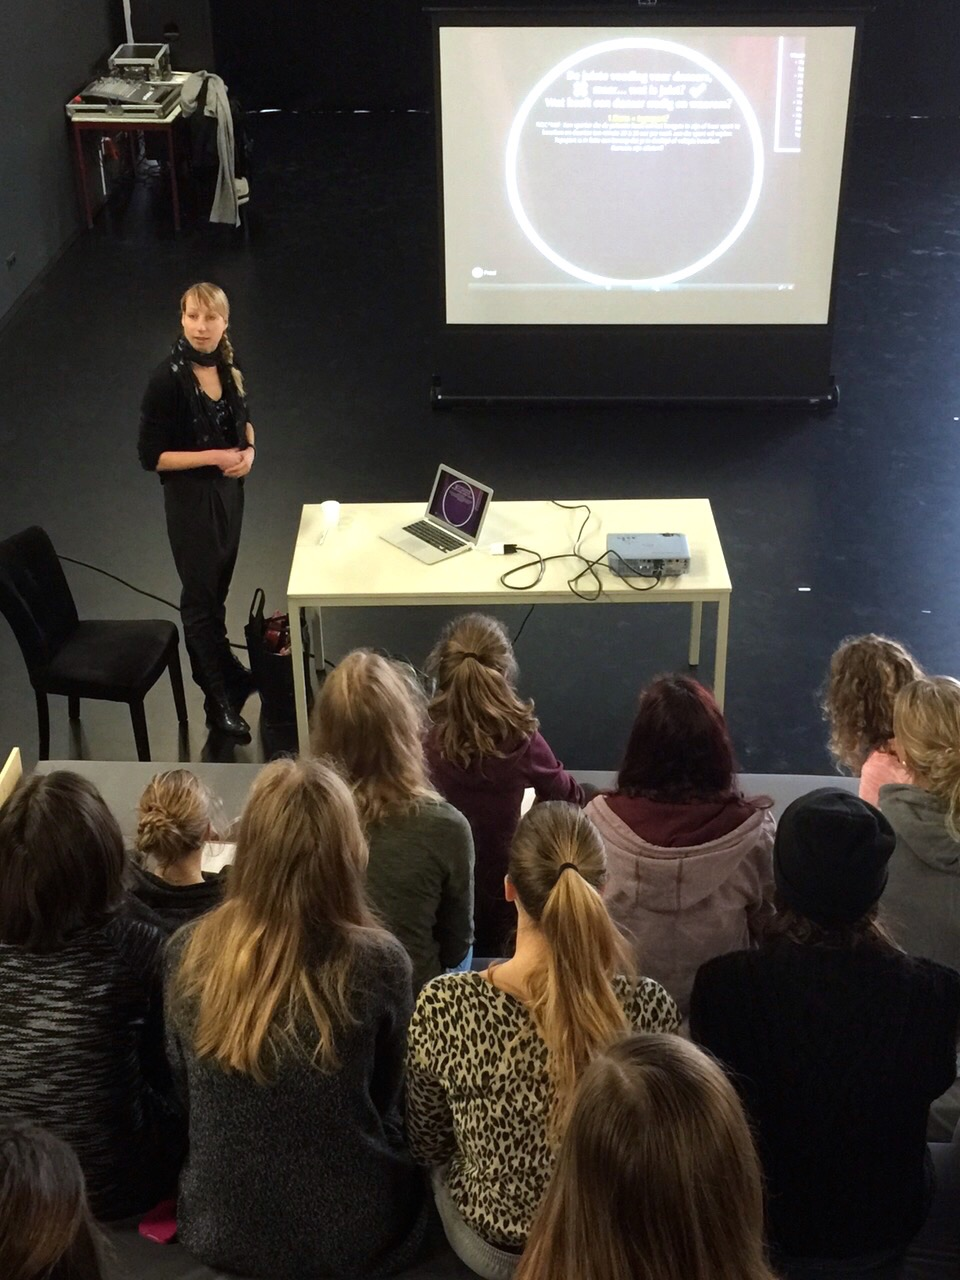 Lezing voeding voor dansers Karin lambrechtse Dans diëtist